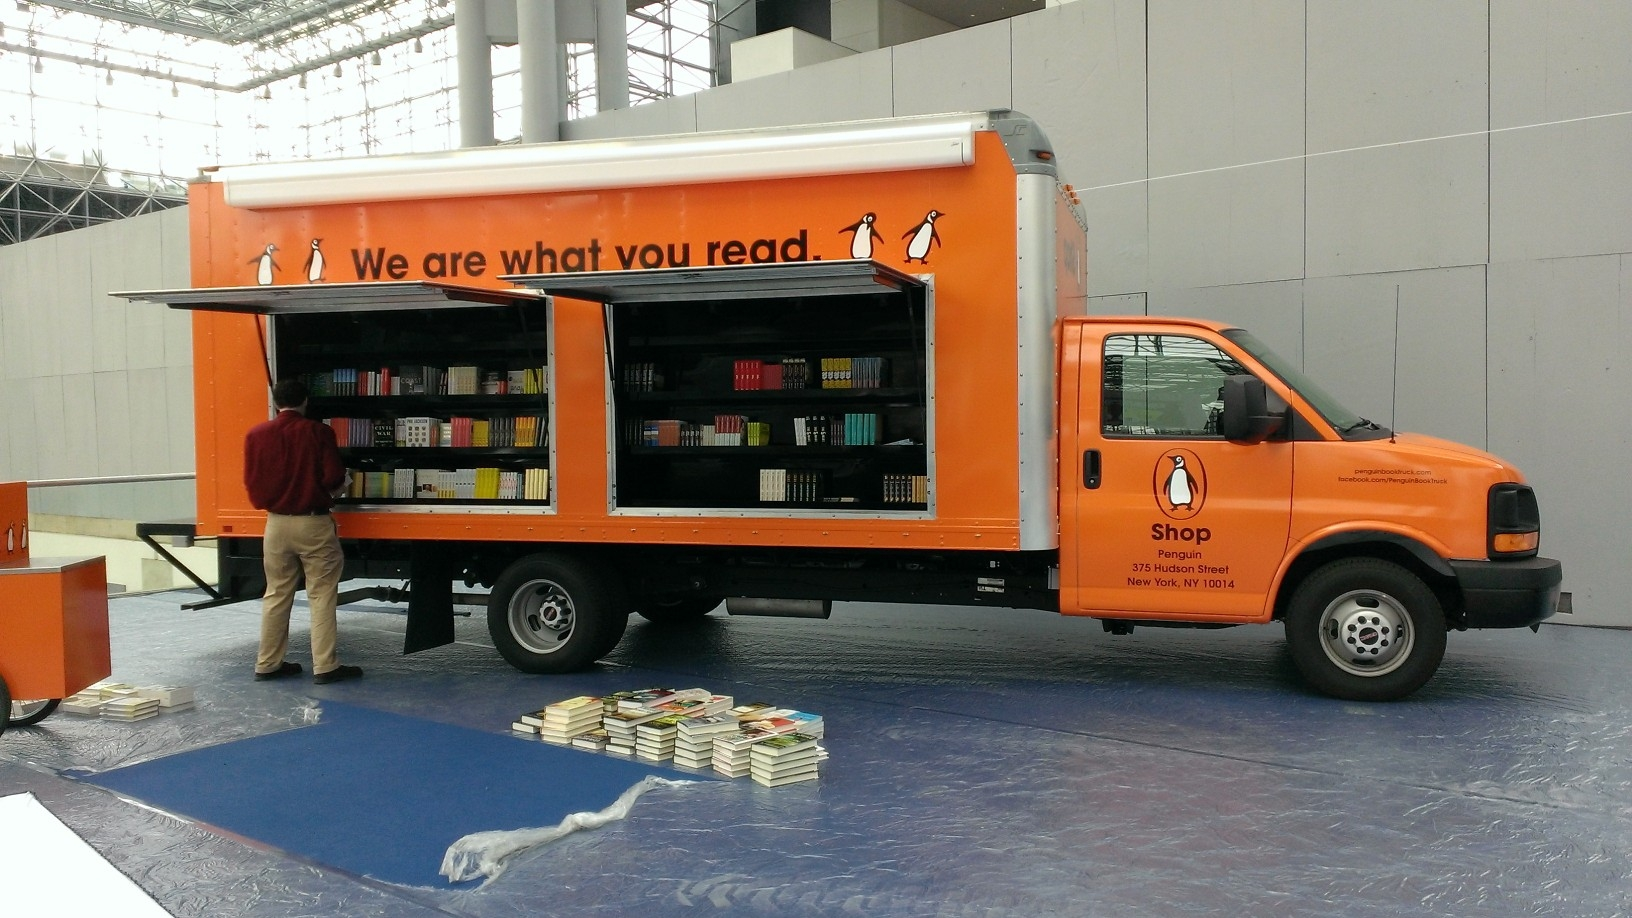 New York Tom Food Truck